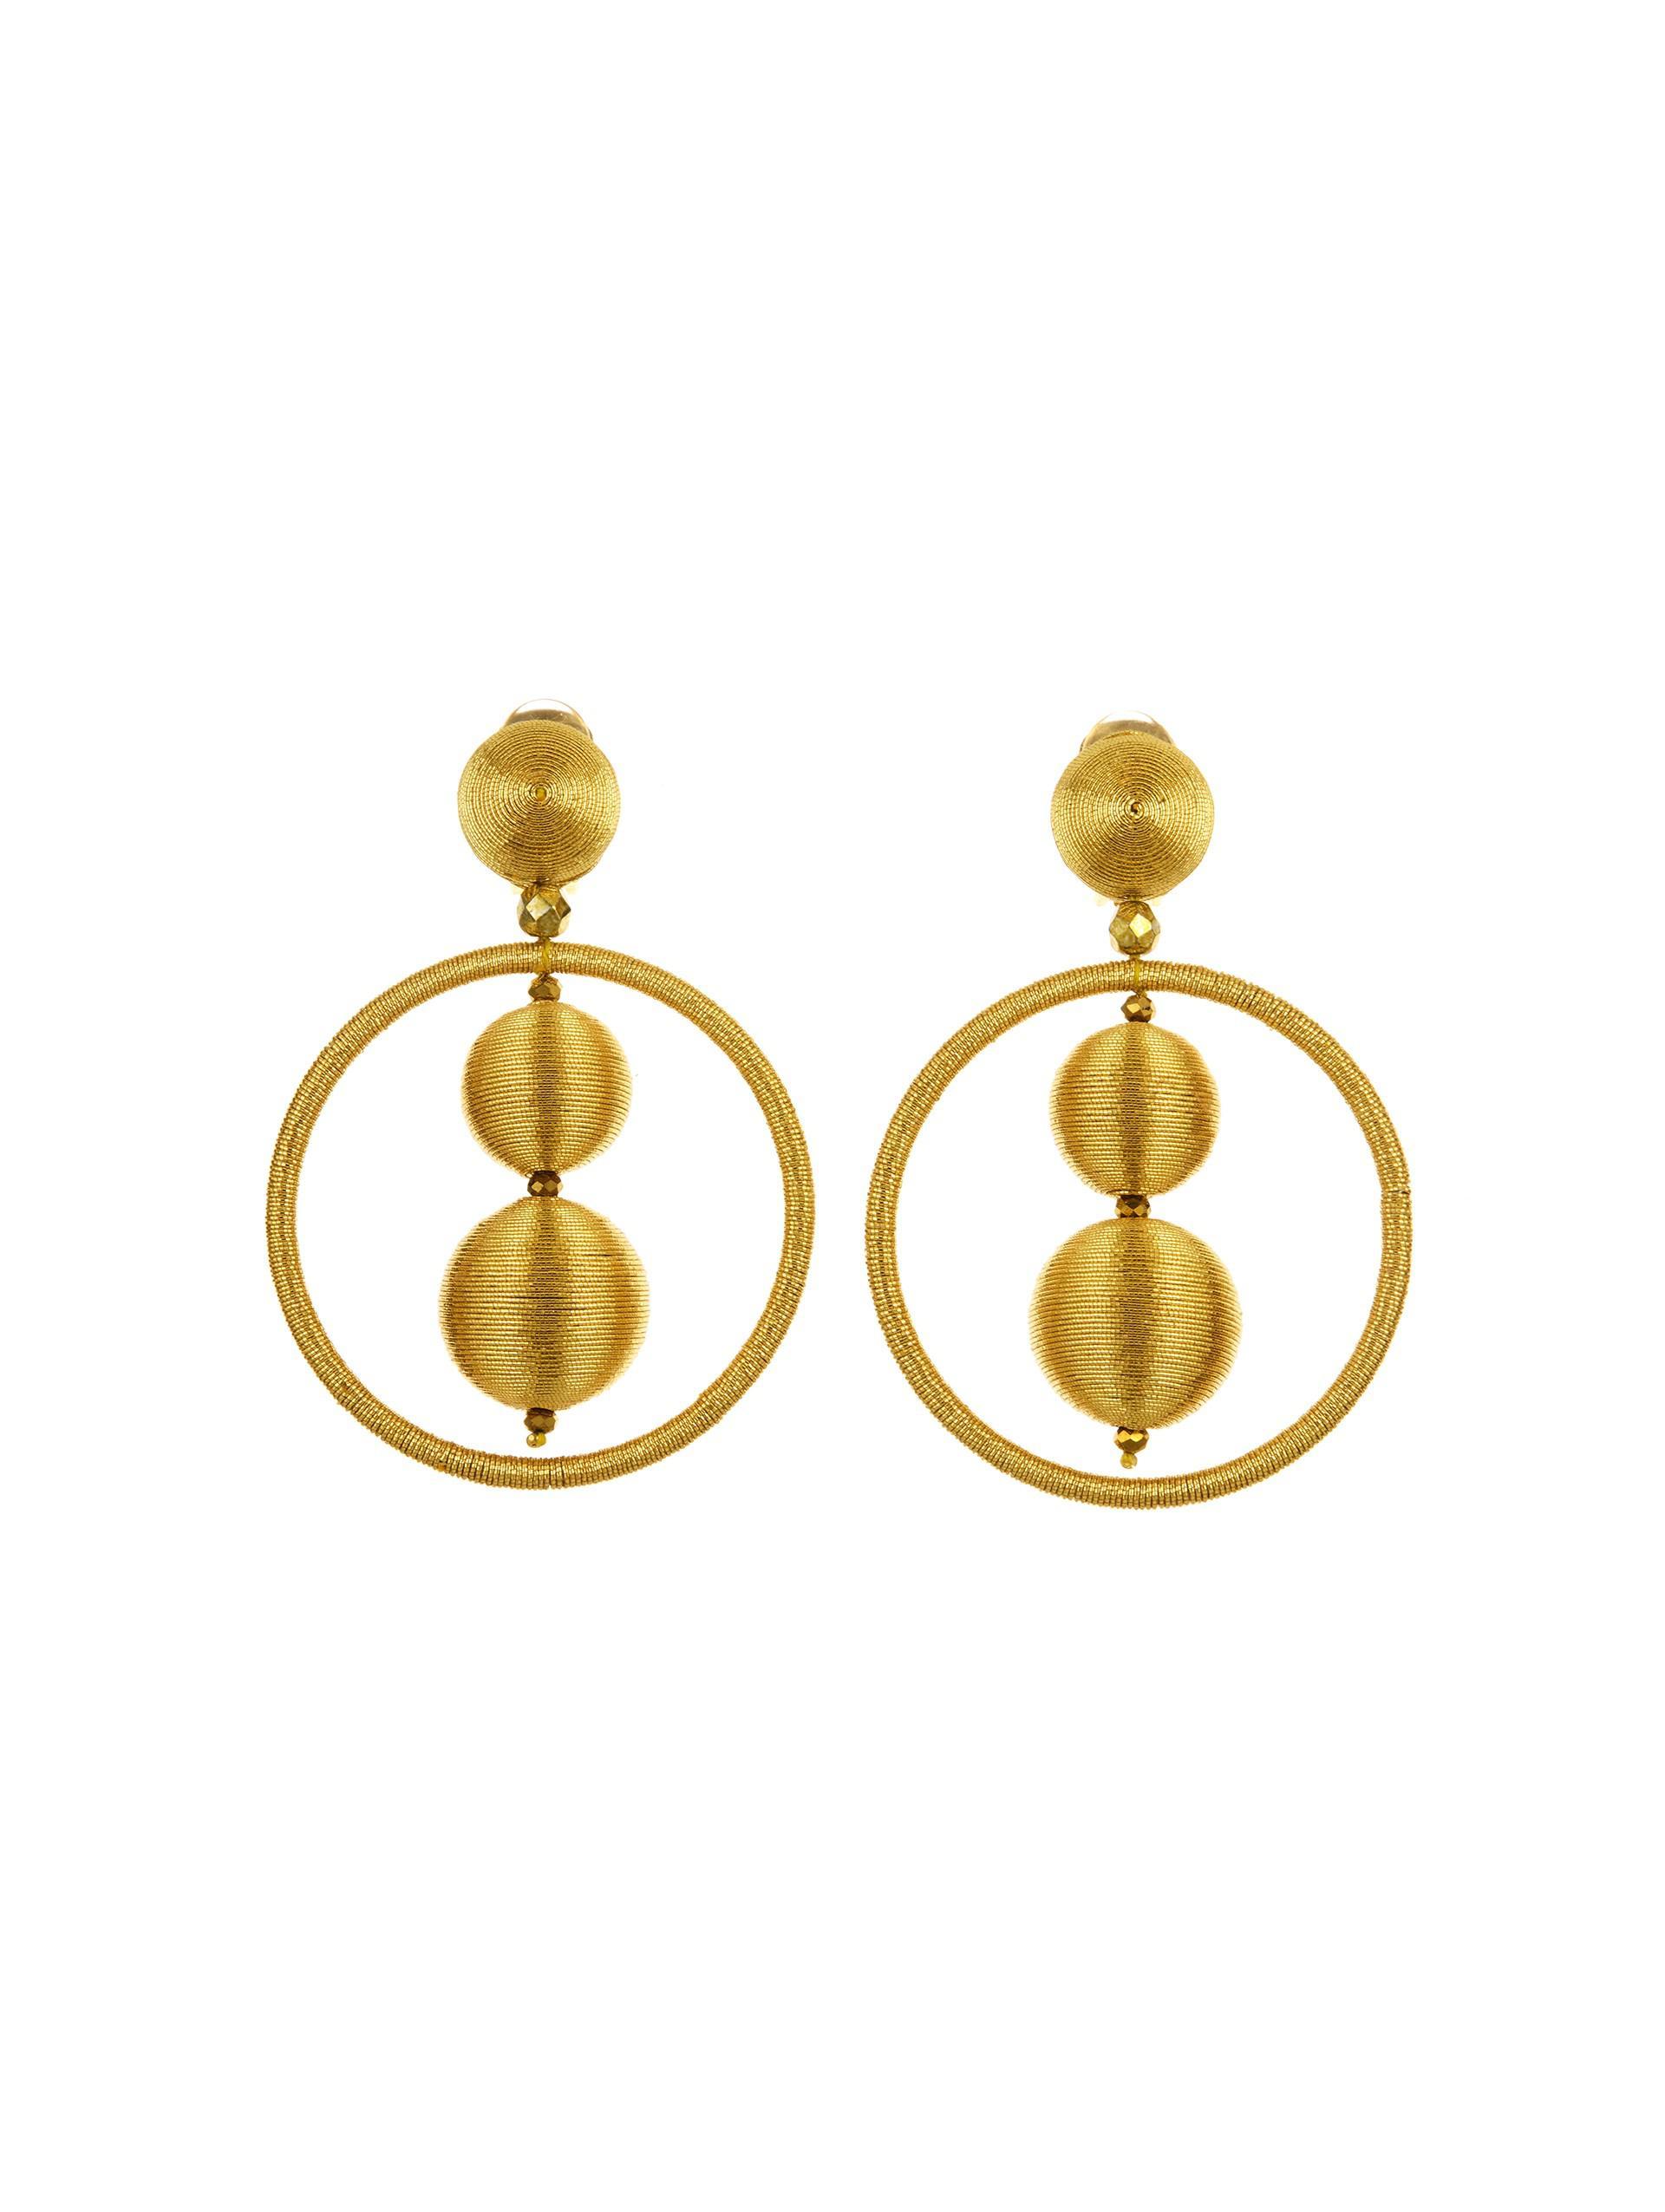 Oscar De La Renta Threaded Bead Hoop Earrings rupMqL